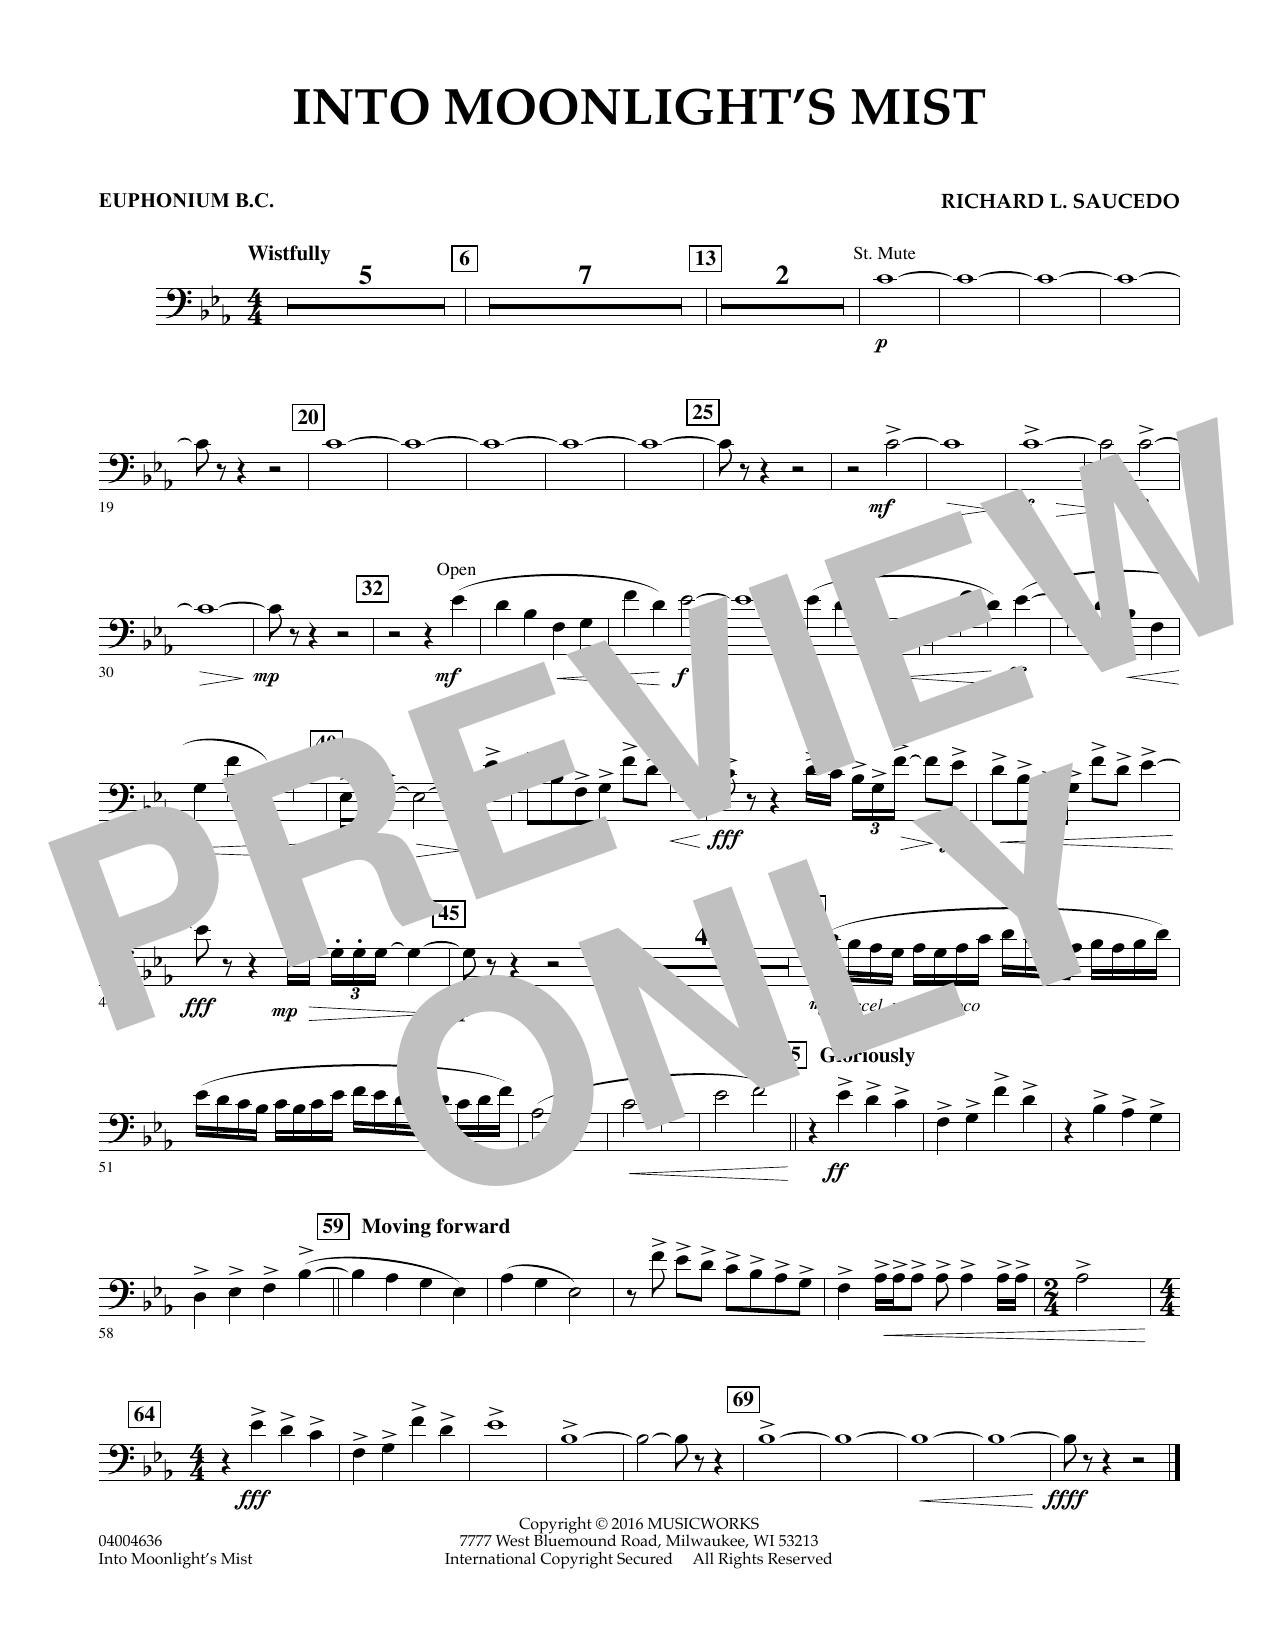 Into Moonlight's Mist - Euphonium in Bass Clef